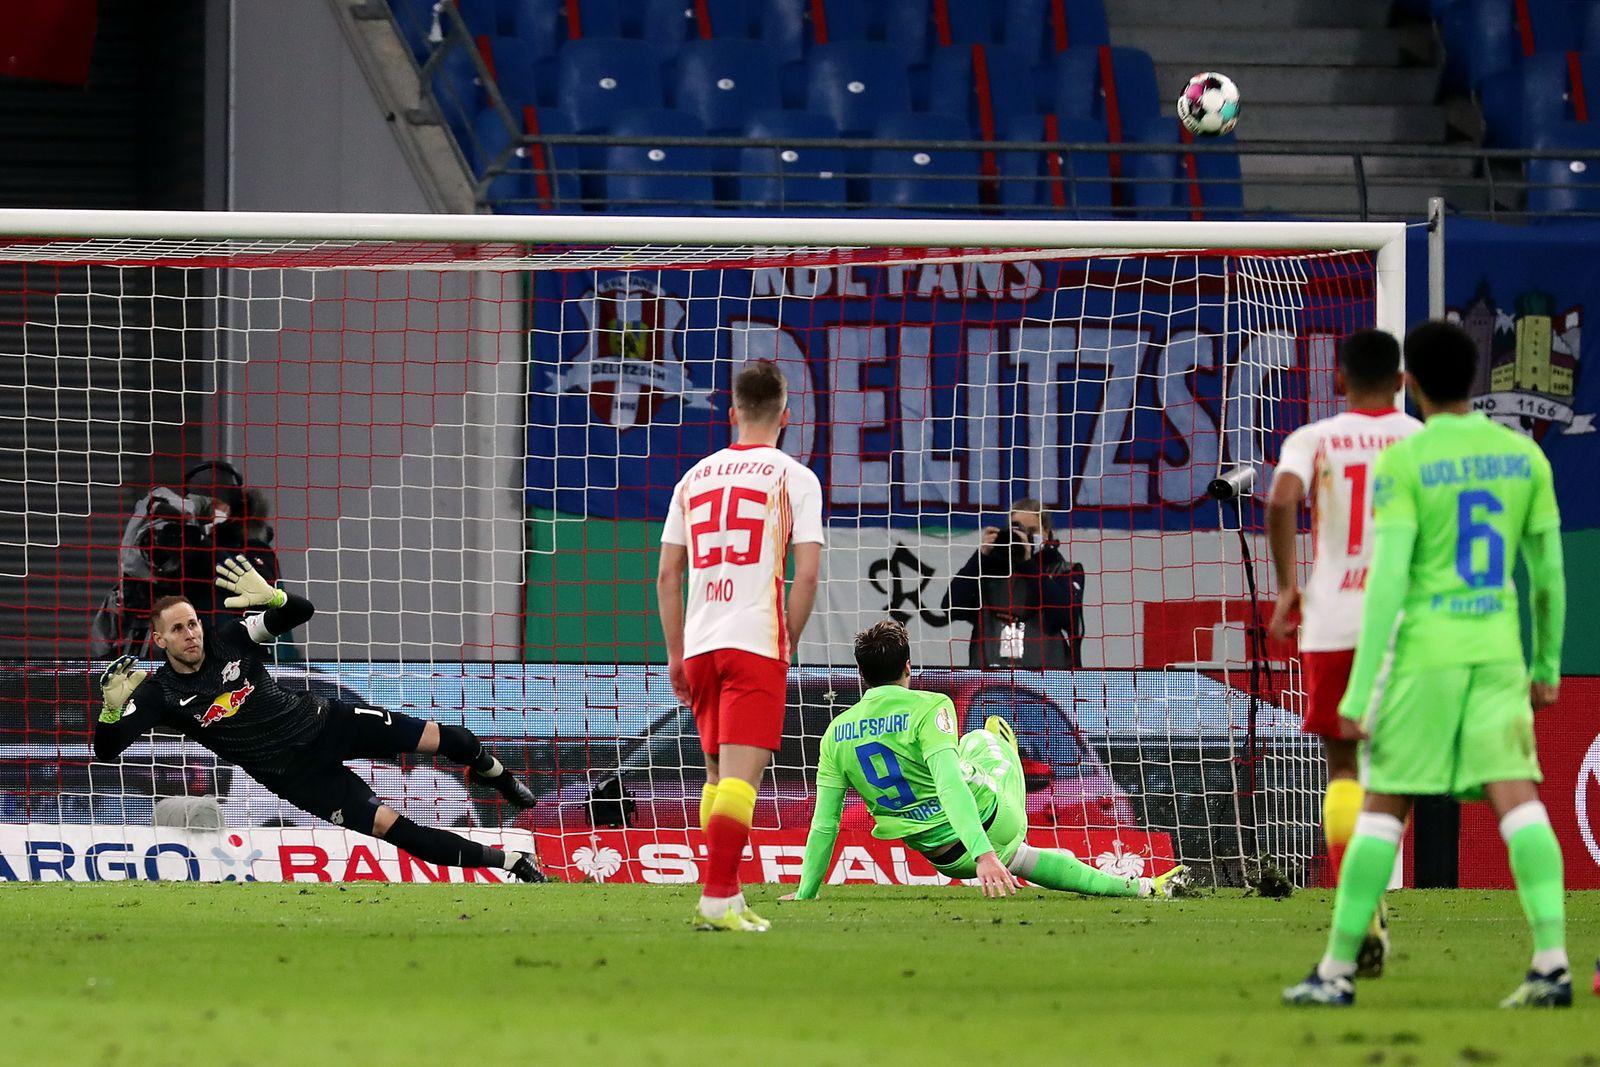 RB Leipzig v VfL Wolfsburg - DFB Cup: Quarter Final